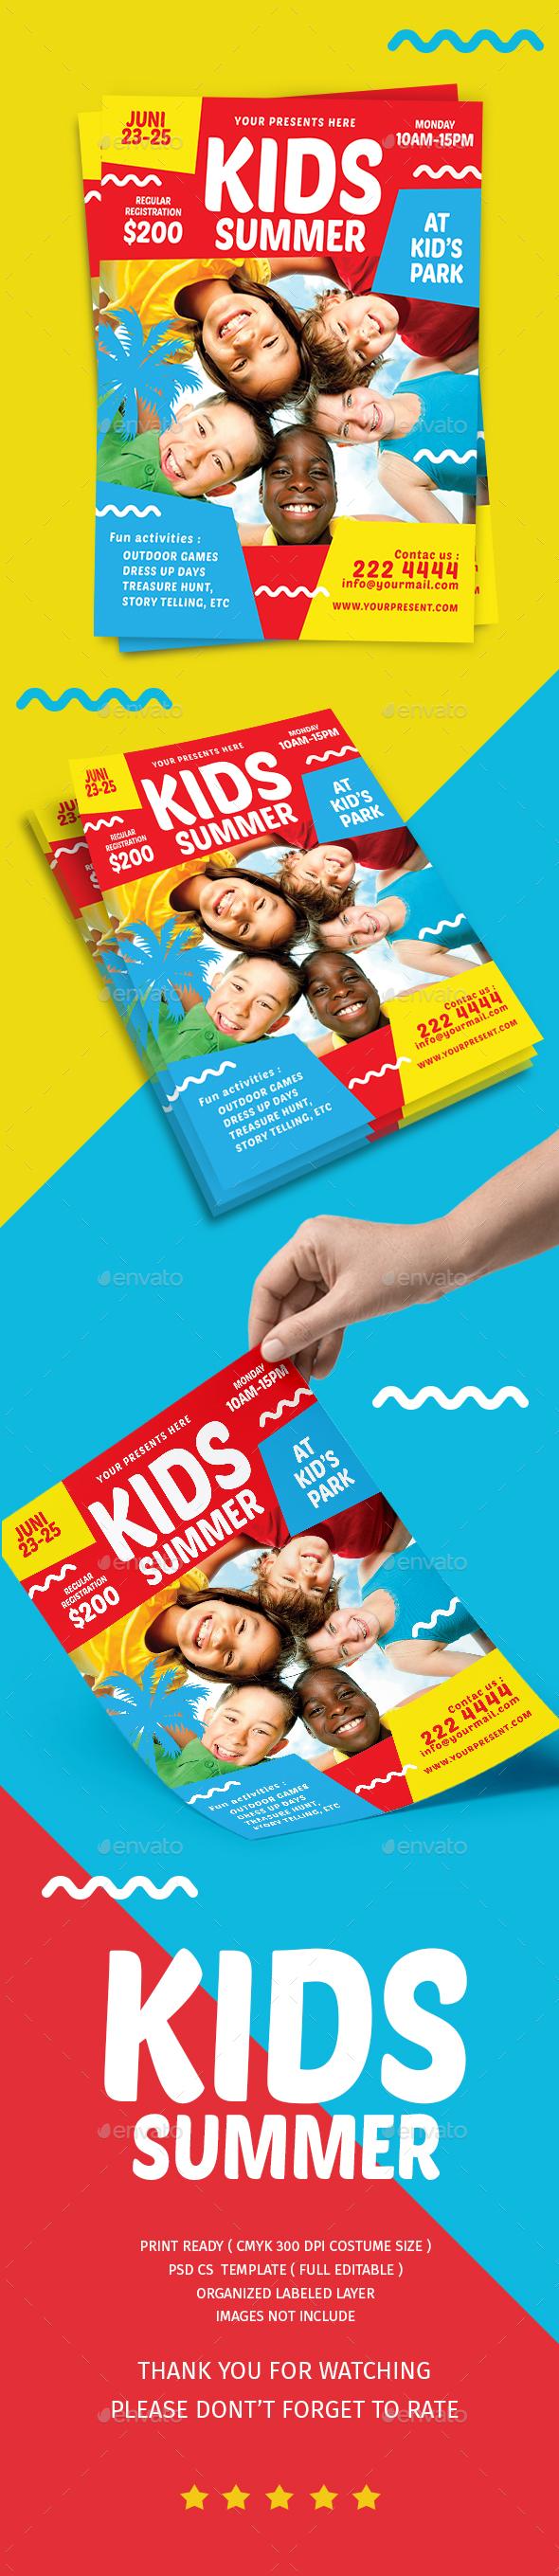 Kids Summer Camp Flyer - Flyers Print Templates